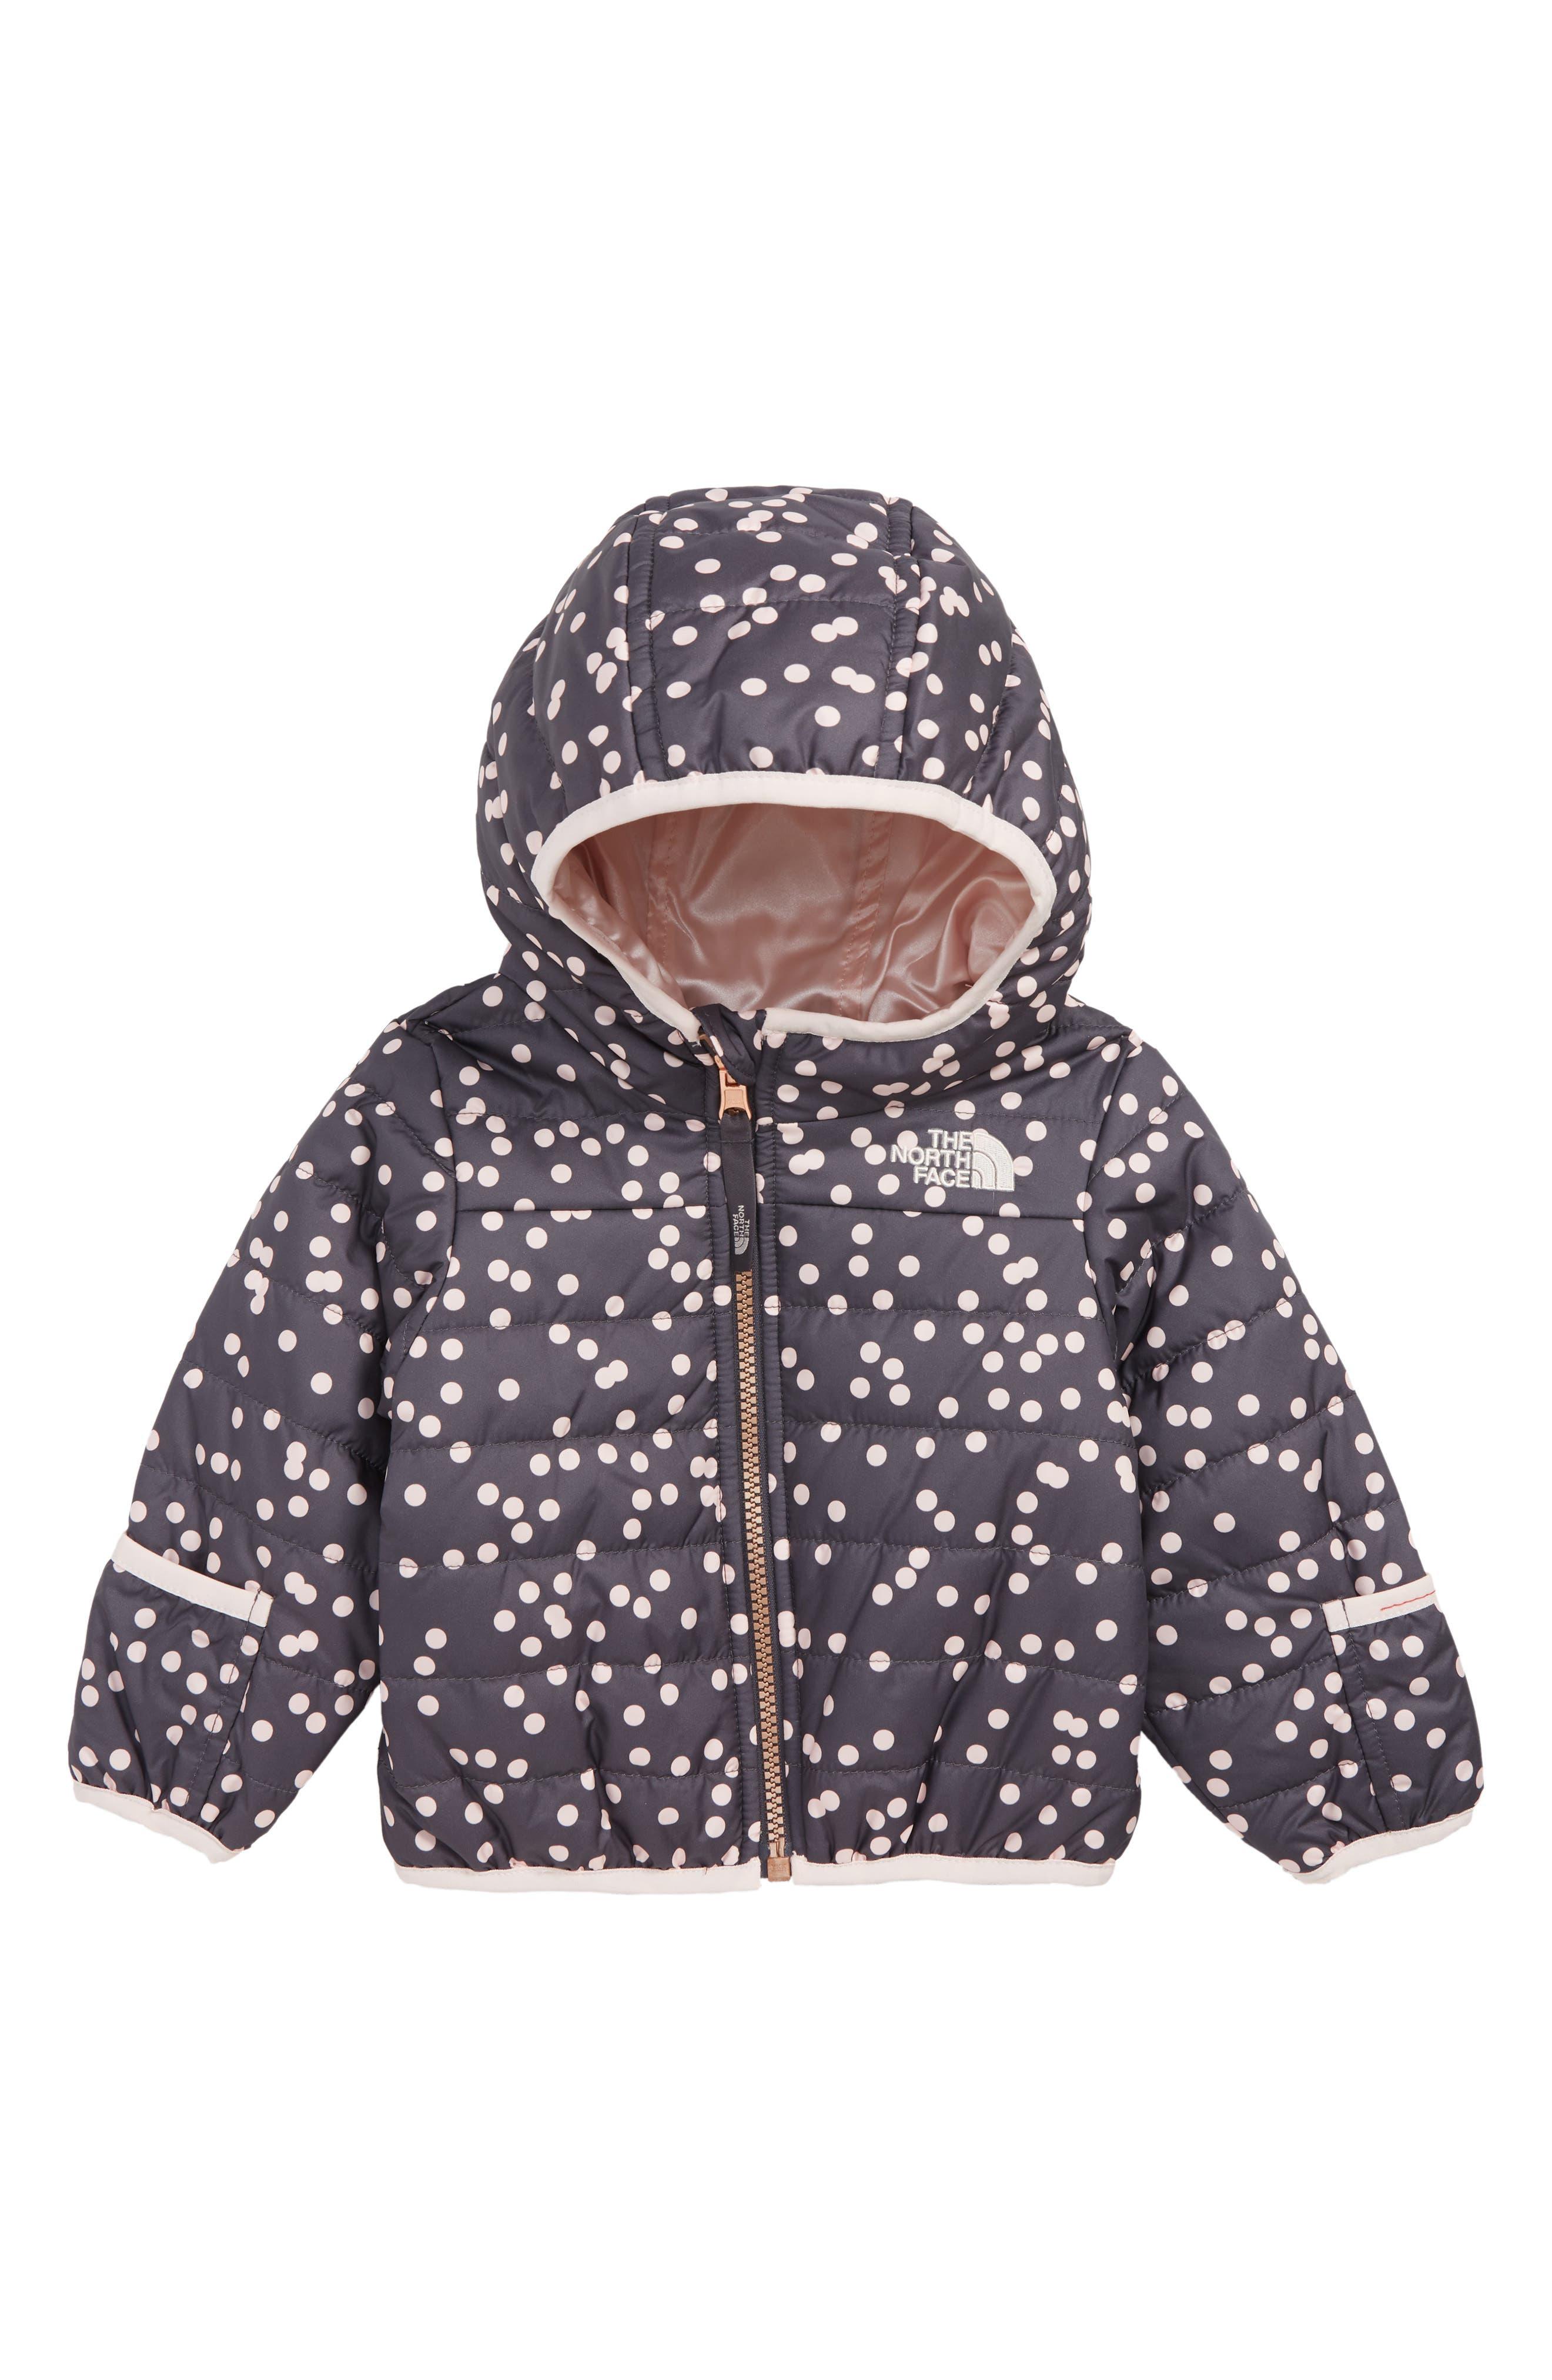 Perrito Reversible Water Repellent Jacket,                         Main,                         color, PERISCOPE GREY/ CONFETTI PRINT